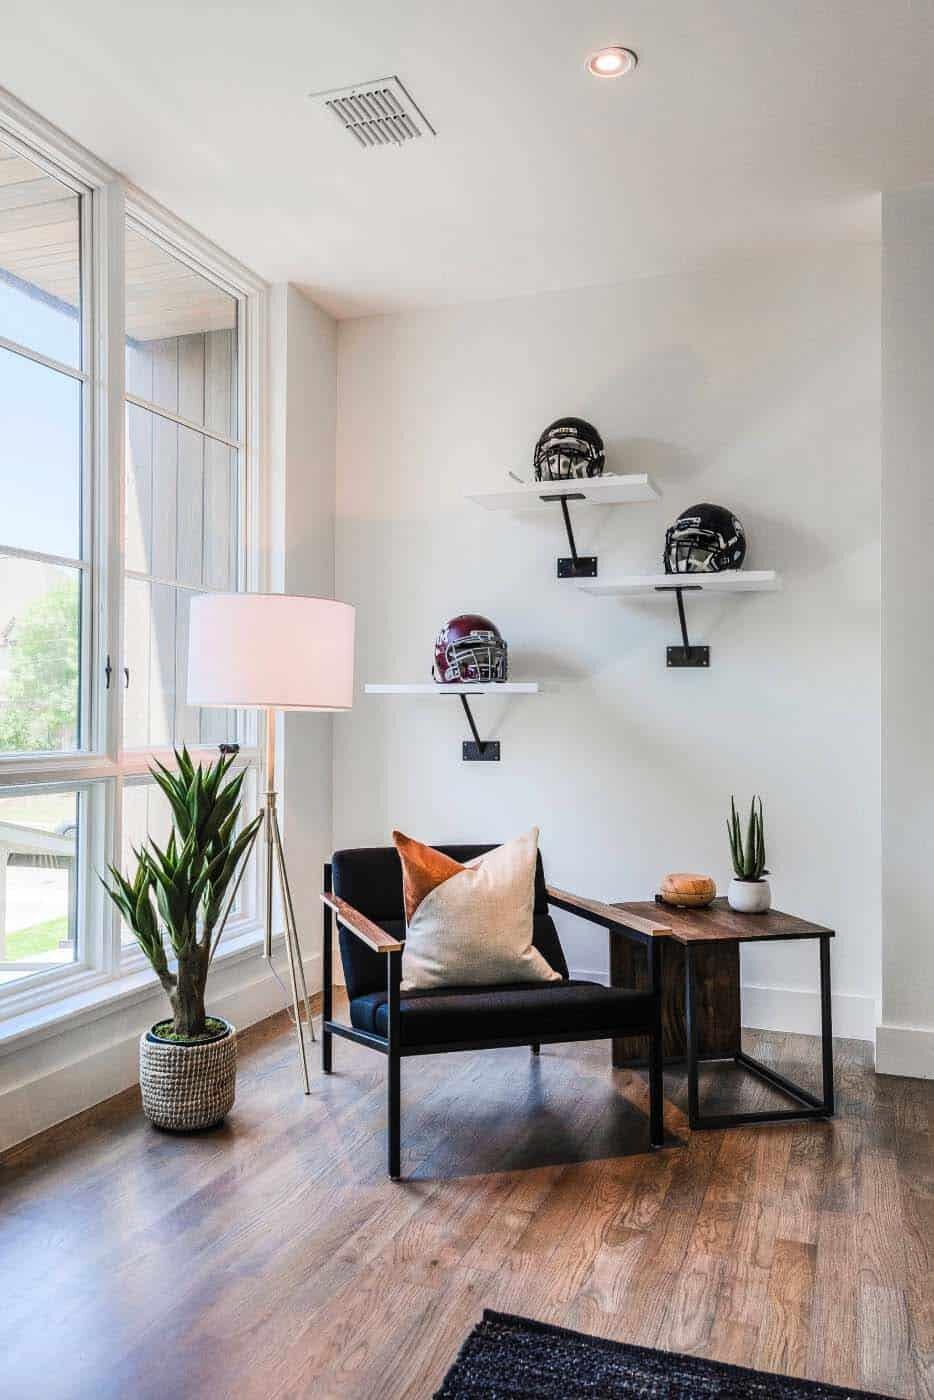 Organic-Modern-Style-Home-Urbanology-Designs-28-1-Kindesign.jpg